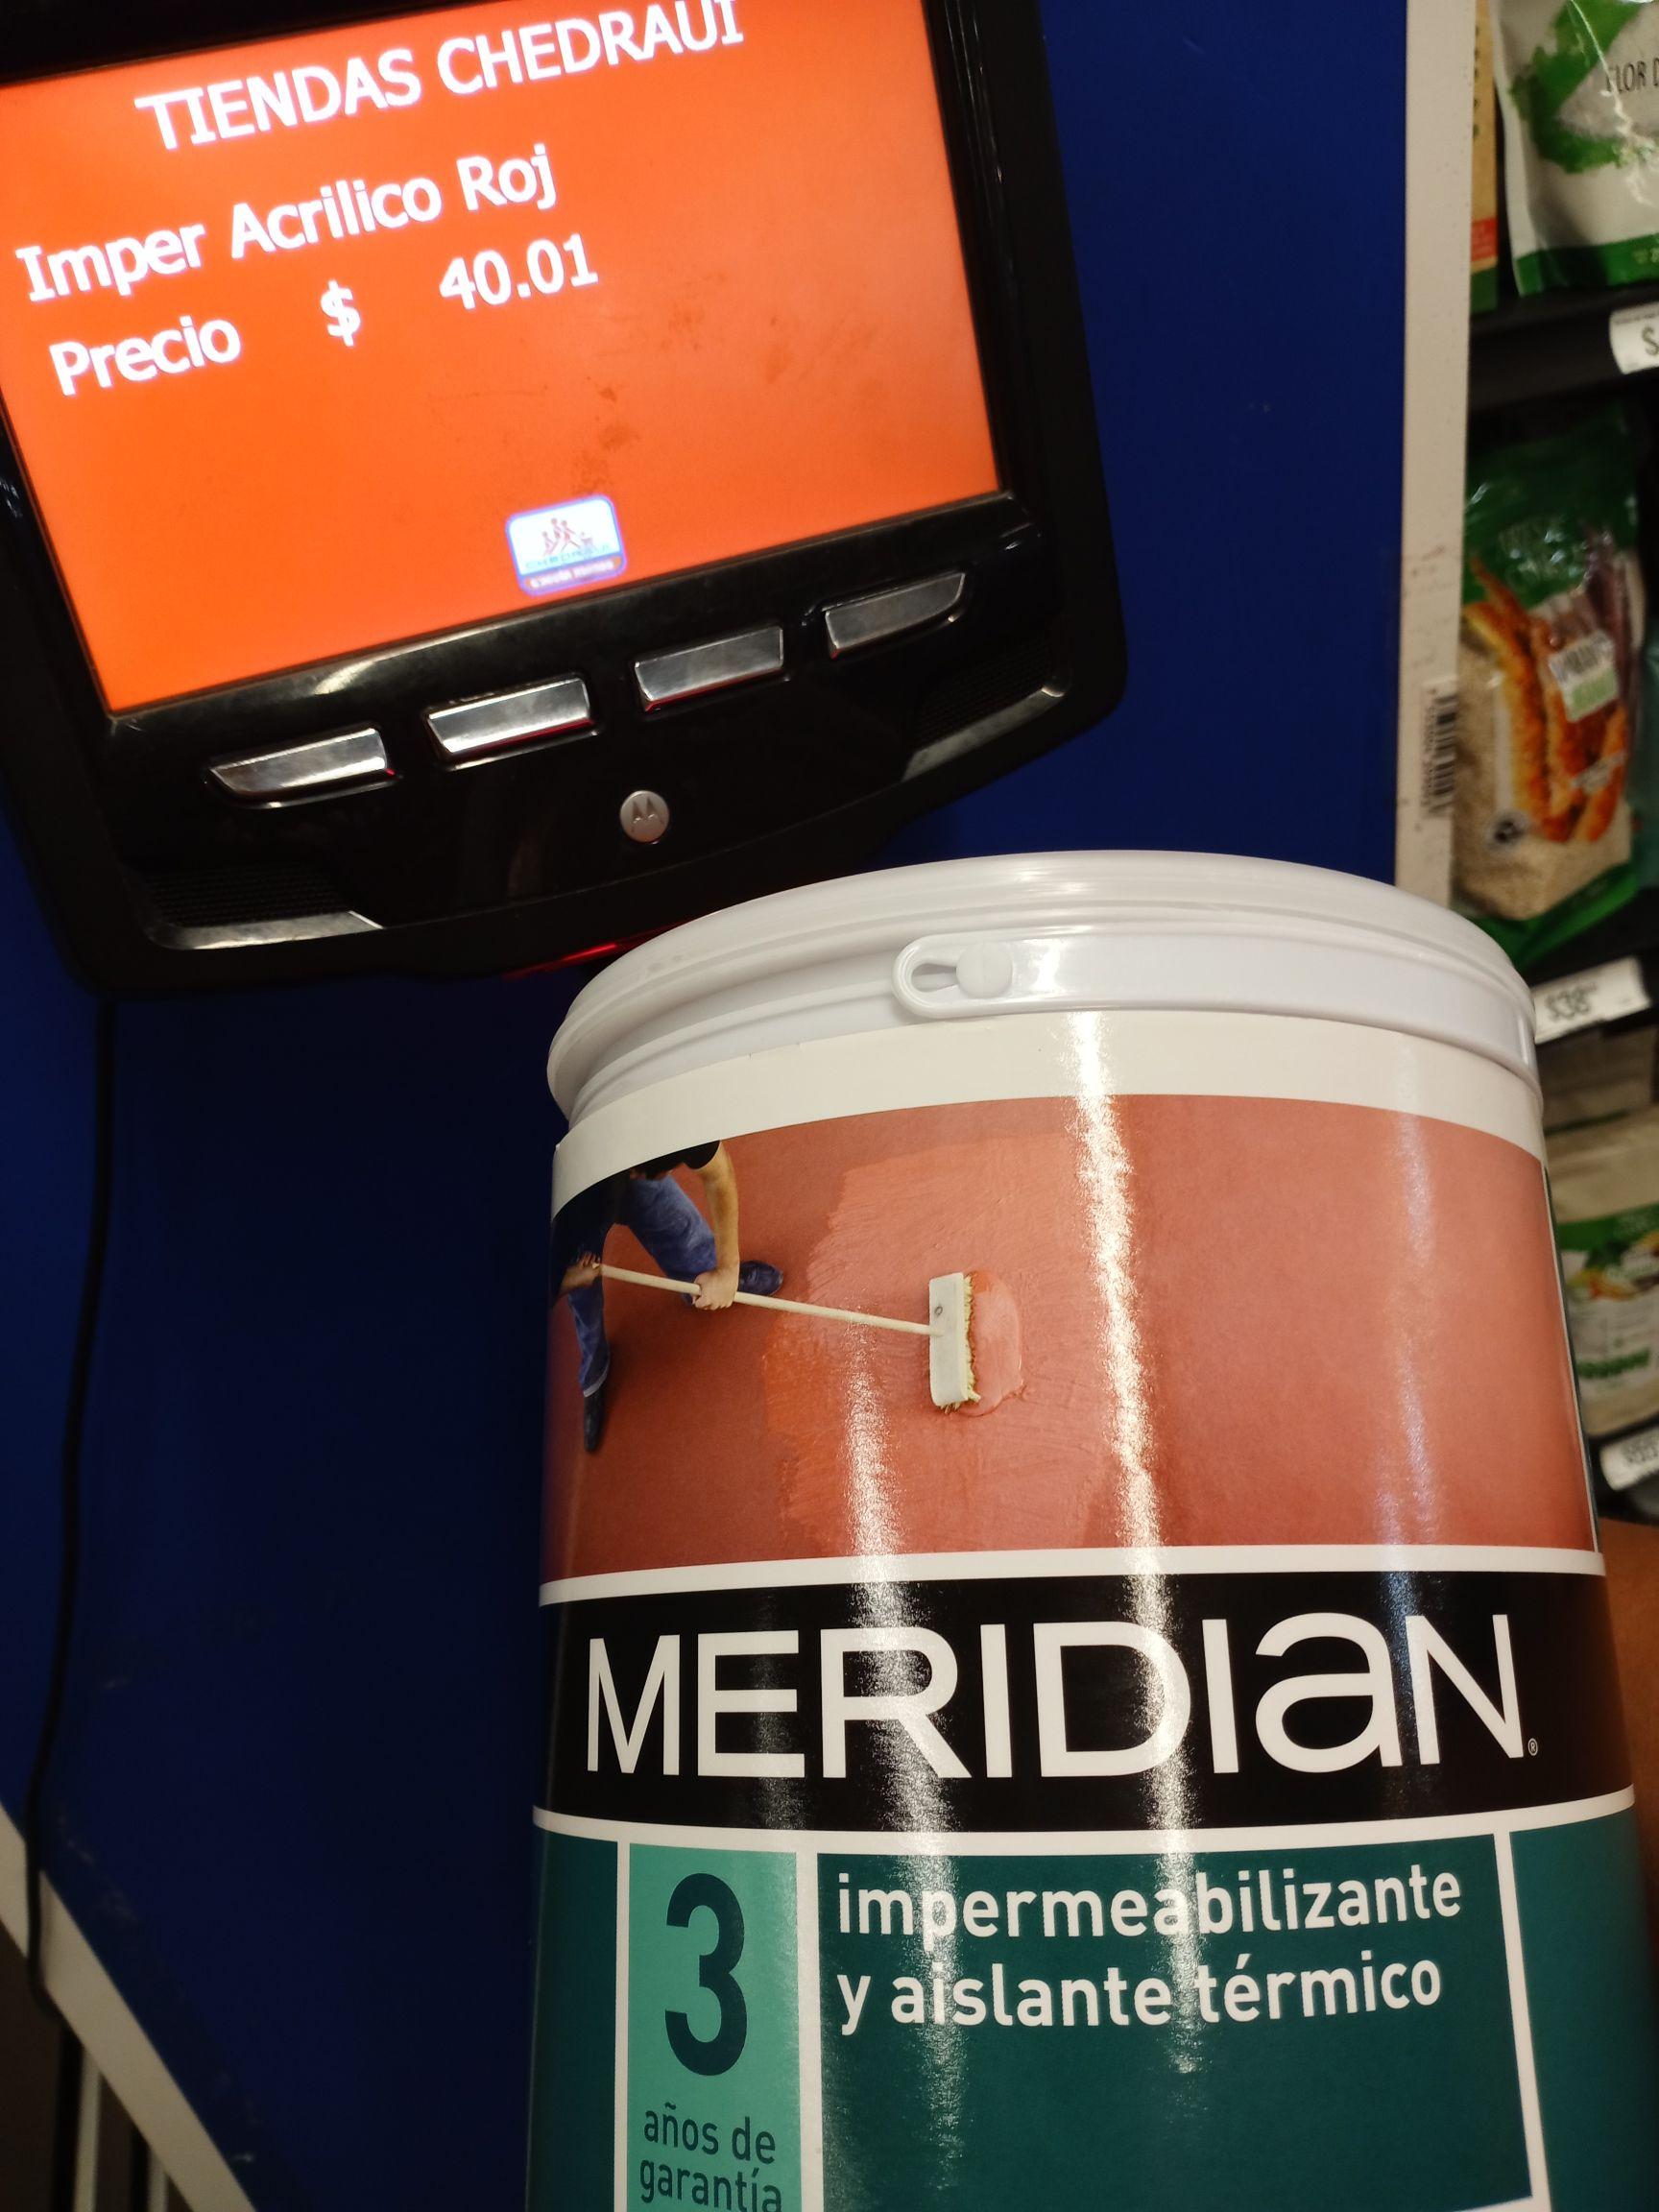 Chedraui: Impermeablilizante en $40.01 frijoles verde valle $9.01 y jabón $5.01